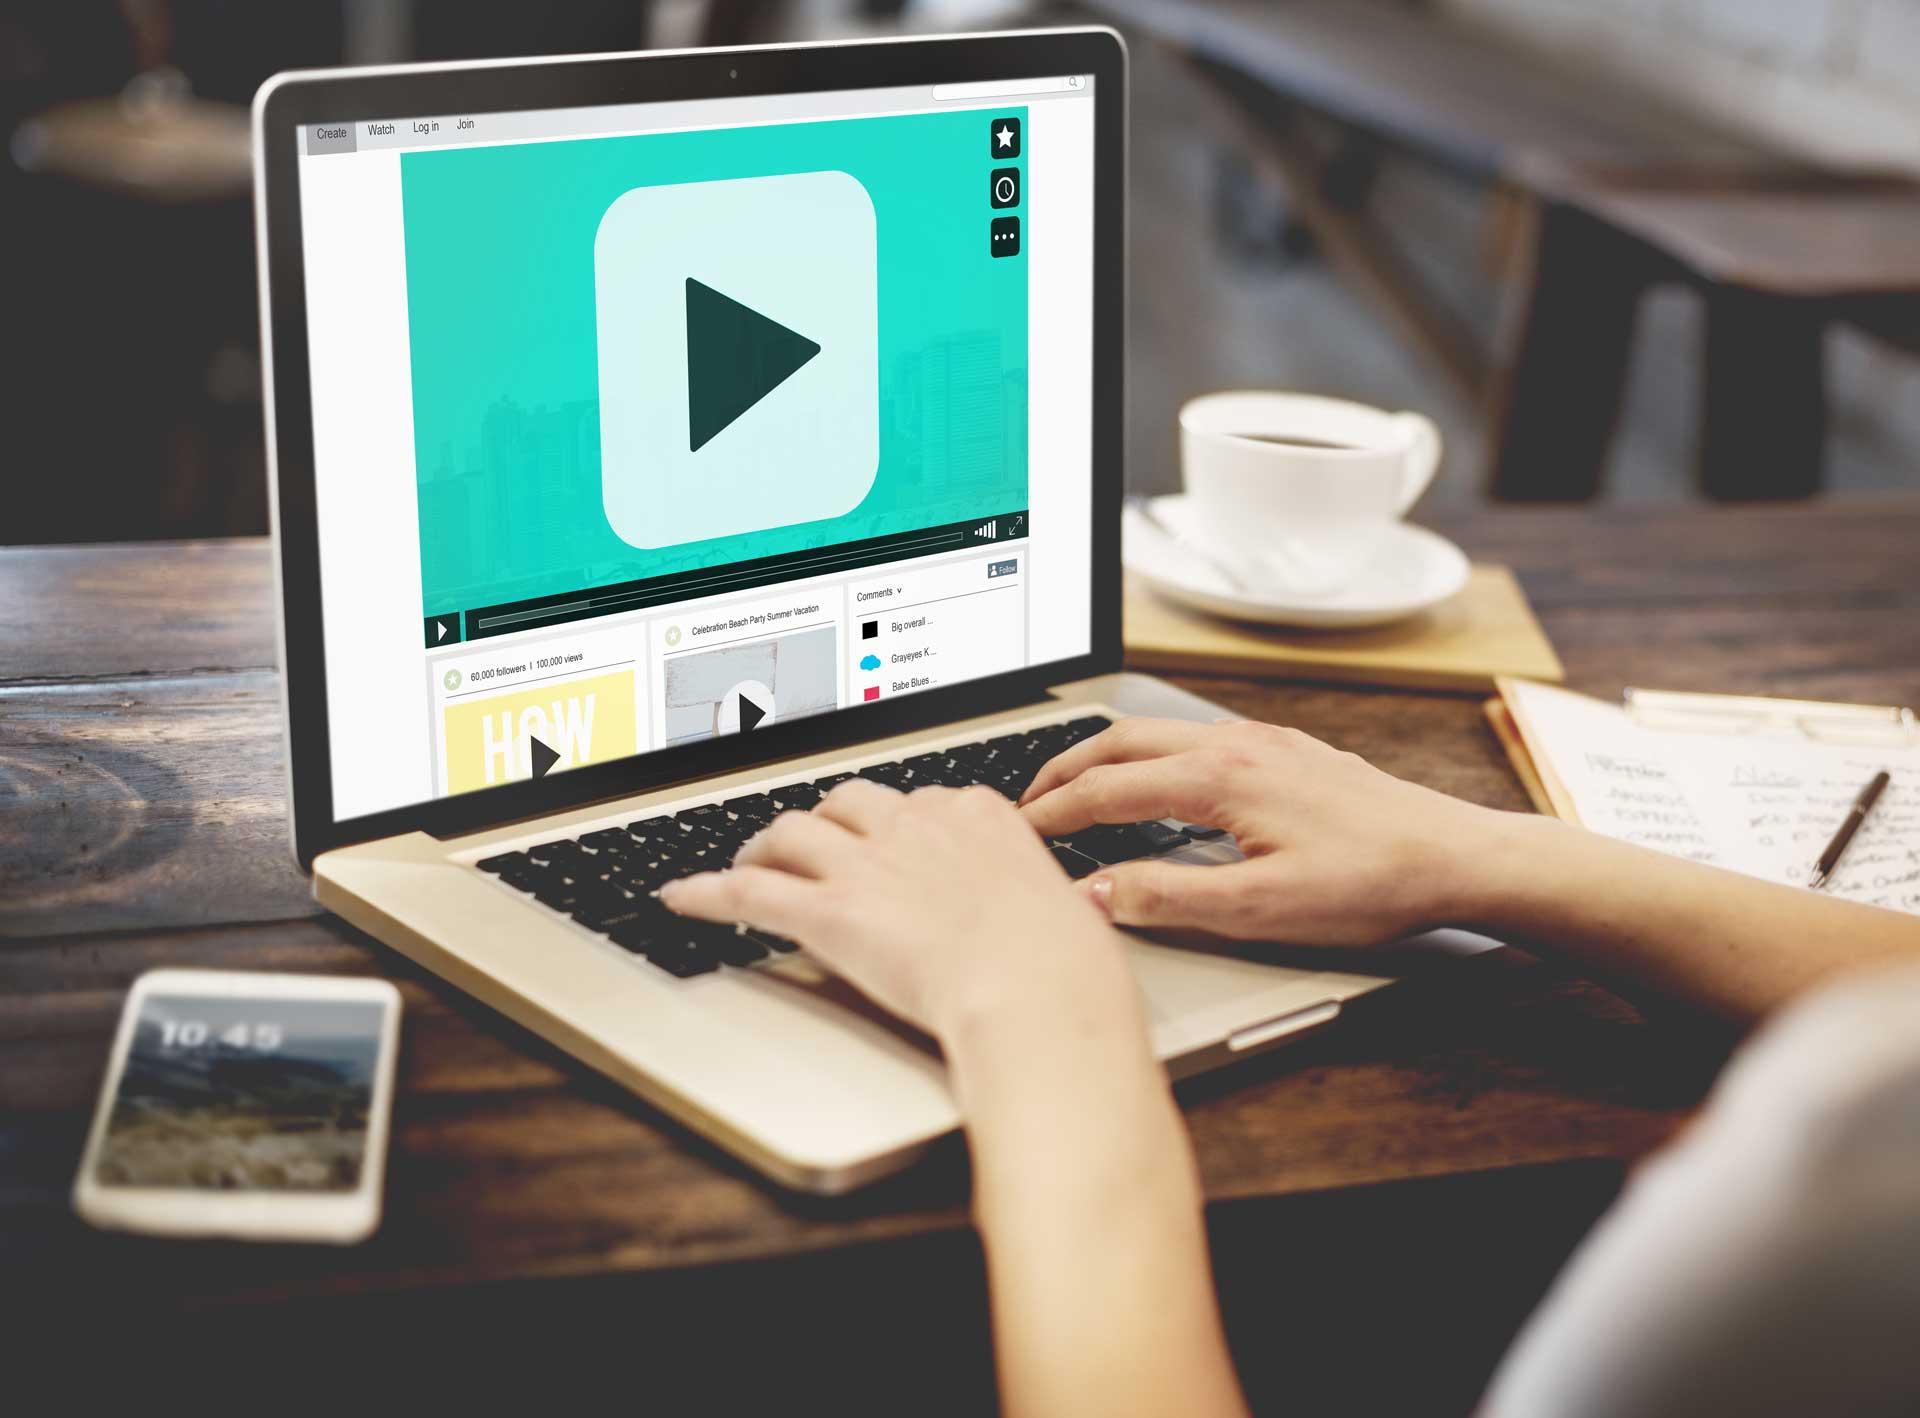 video-laptop-editing-ss-1920